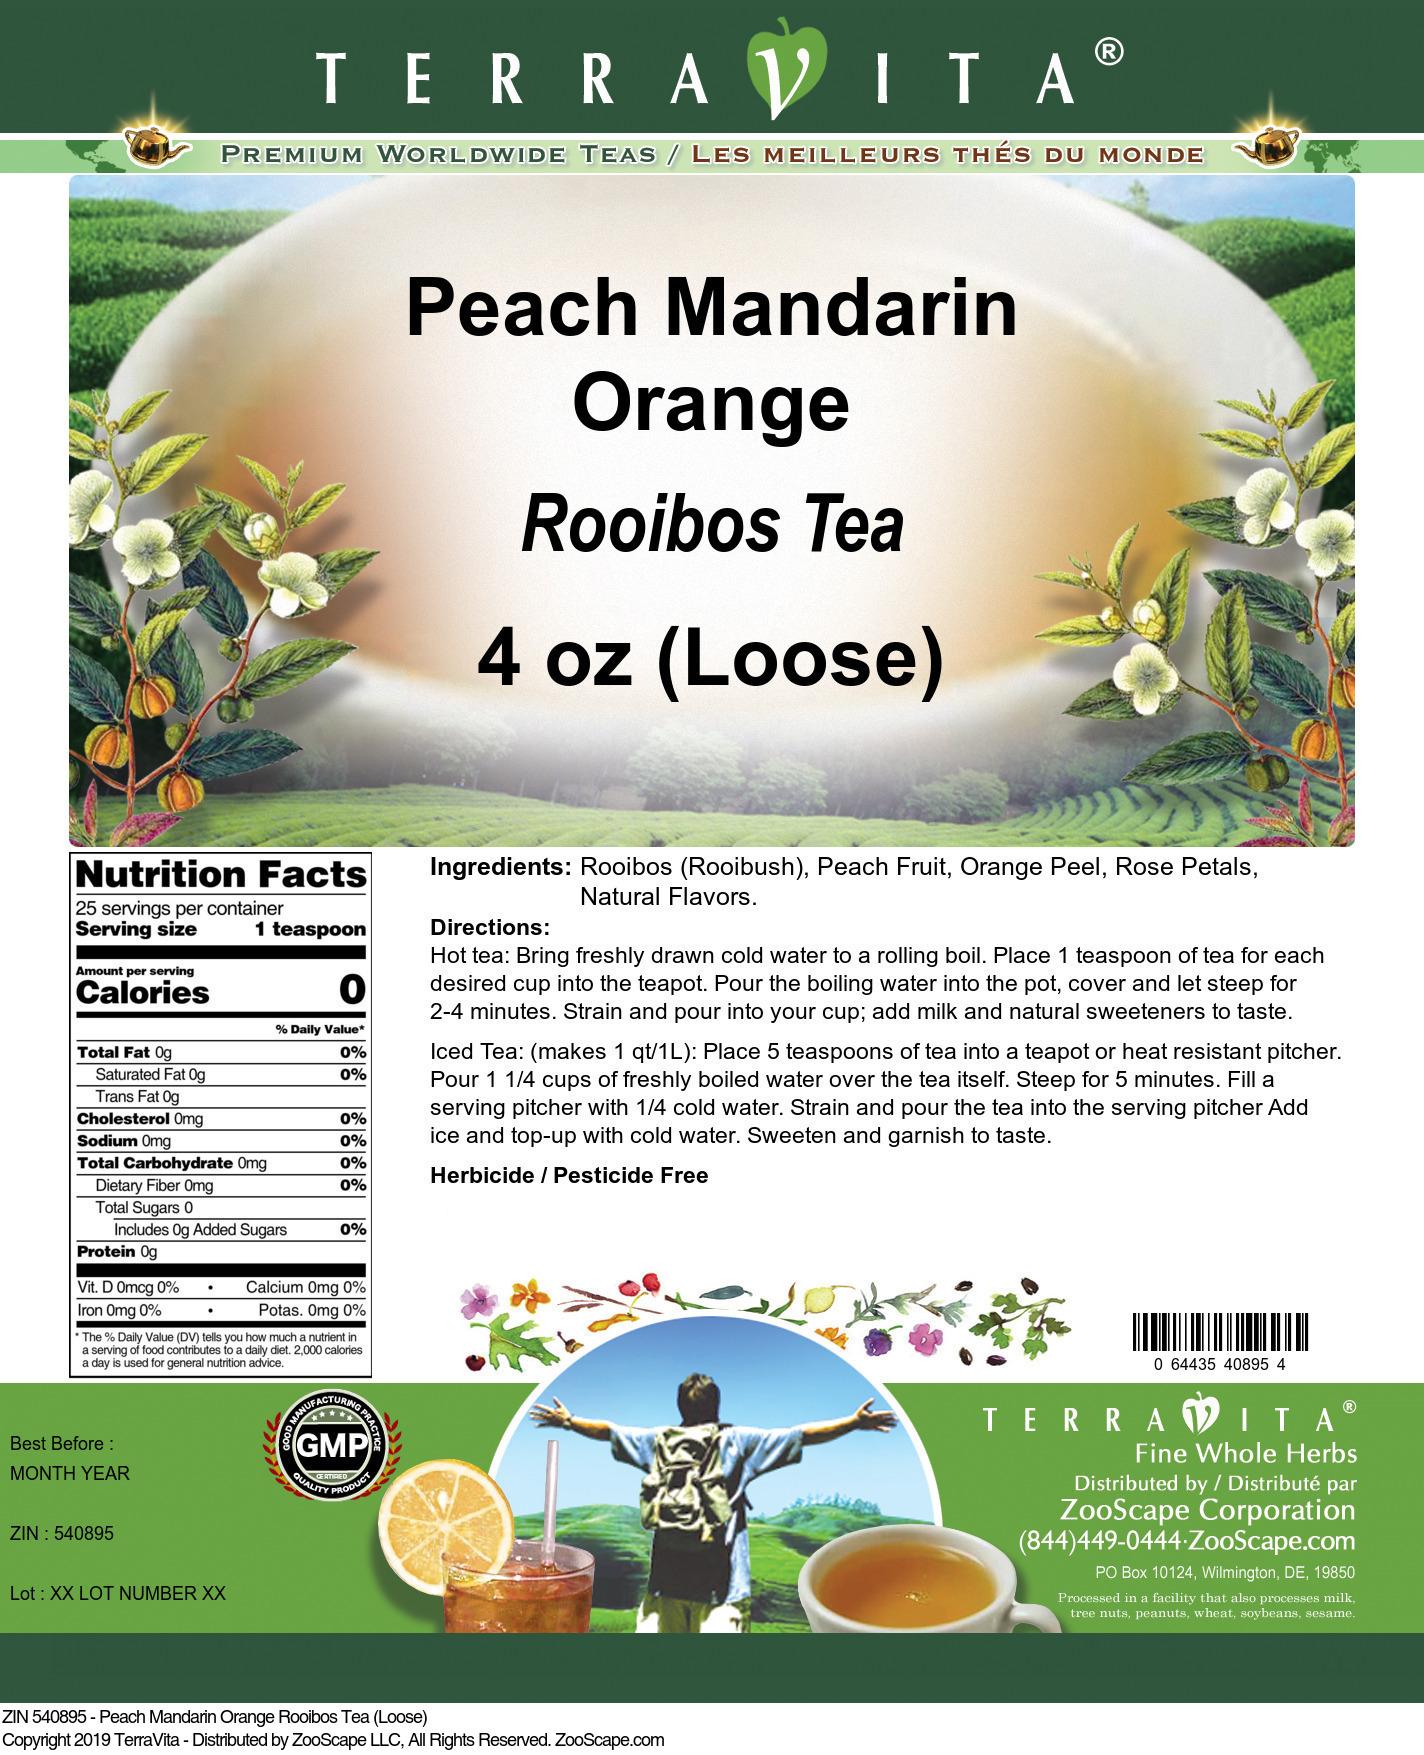 Peach Mandarin Orange Rooibos Tea (Loose)